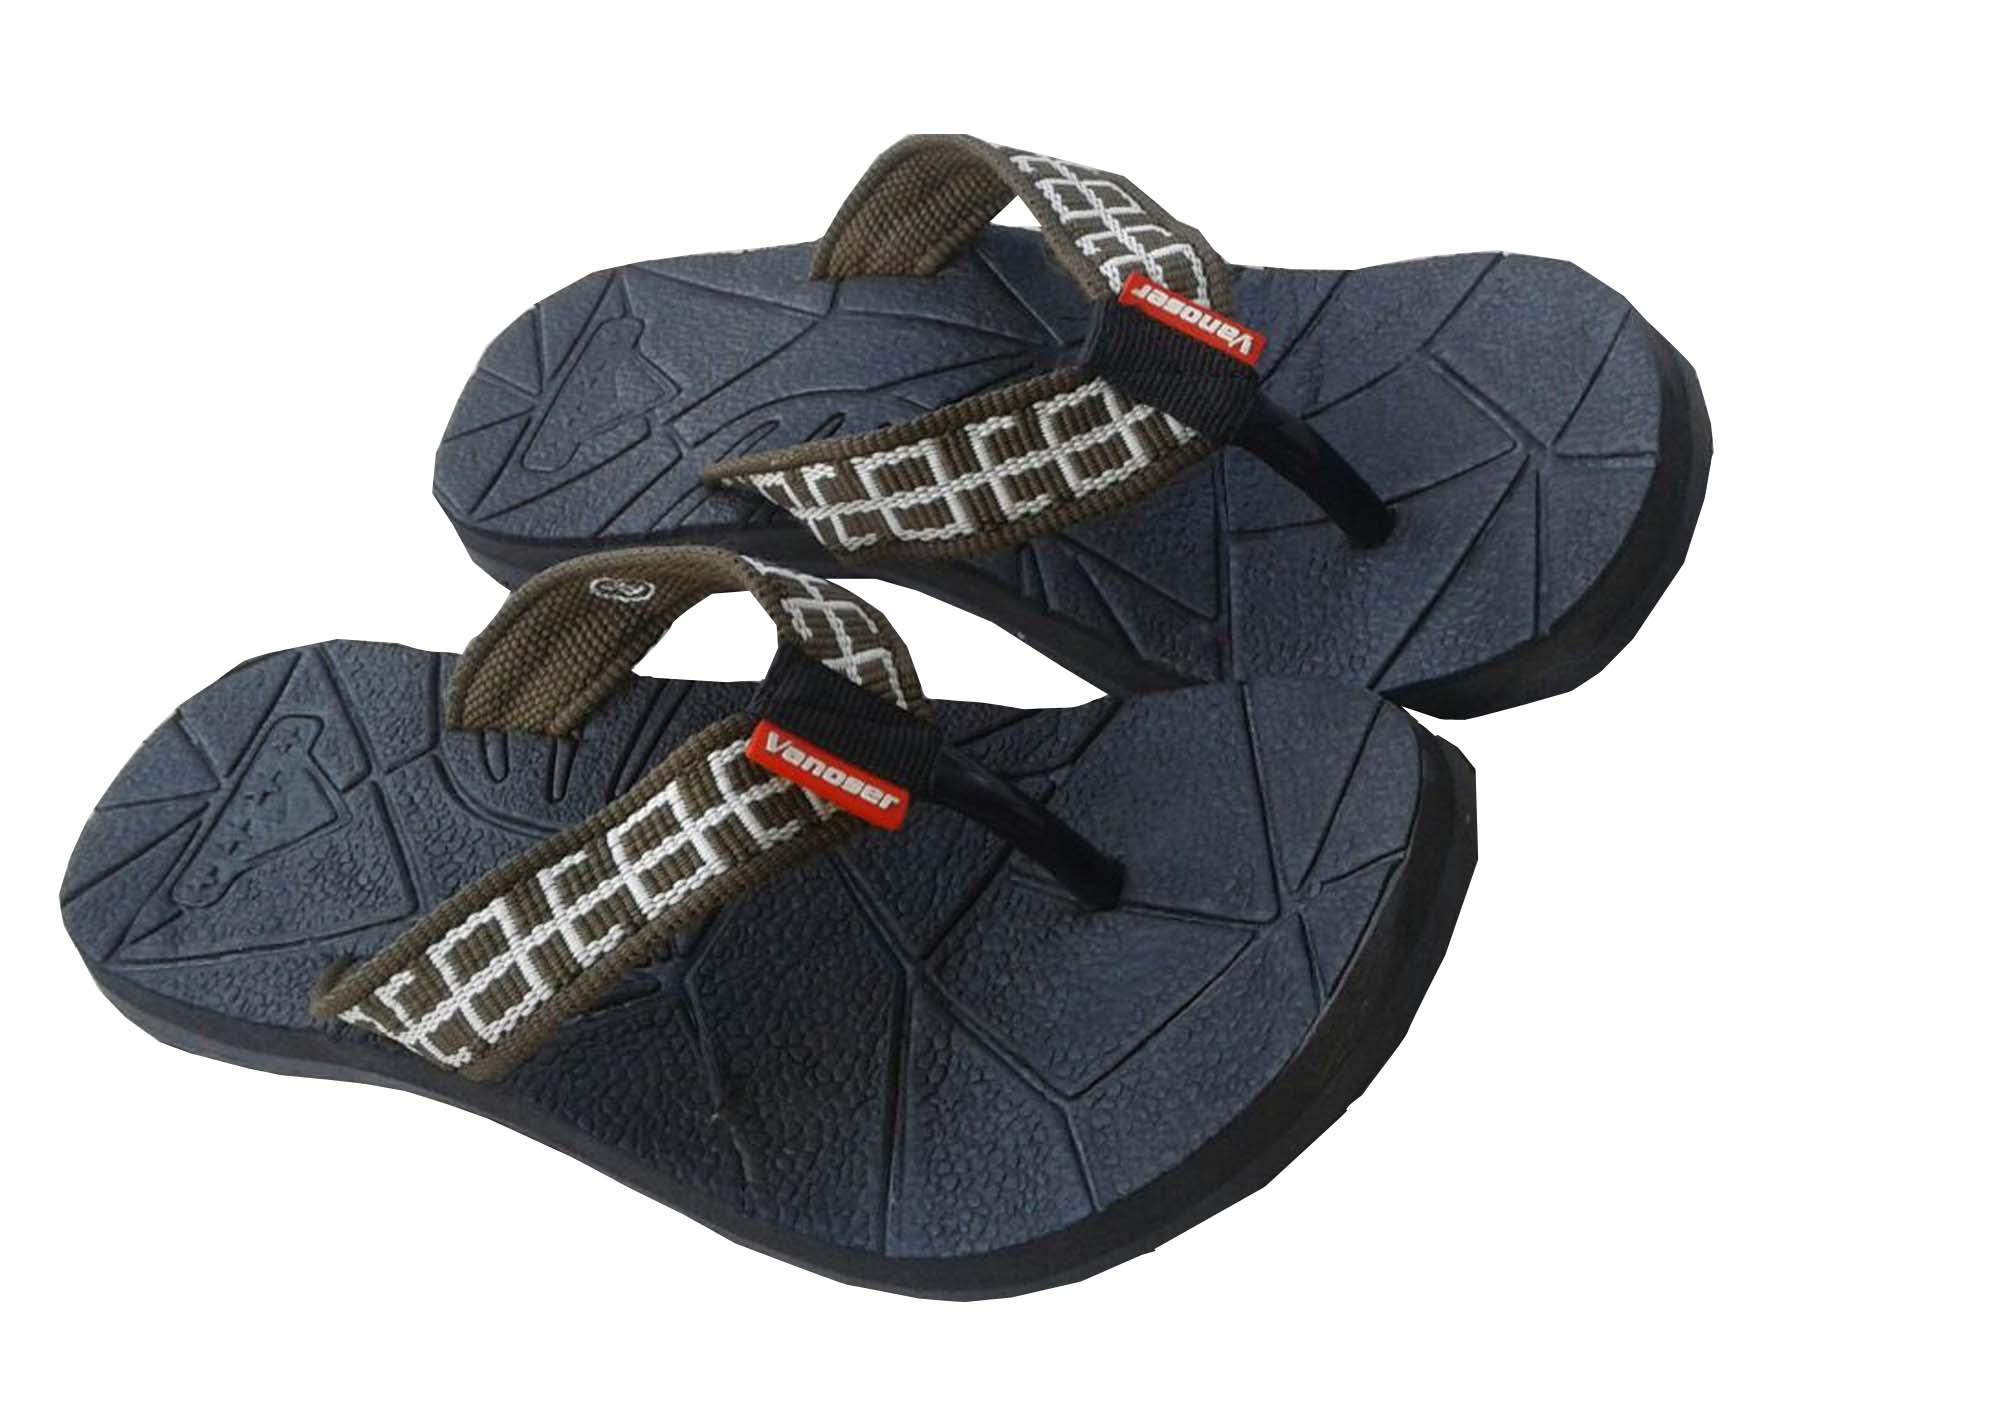 Diky noval/ Sandal Gunung/ Sandal Pria/ Collection Sepatu Sandal Gunung